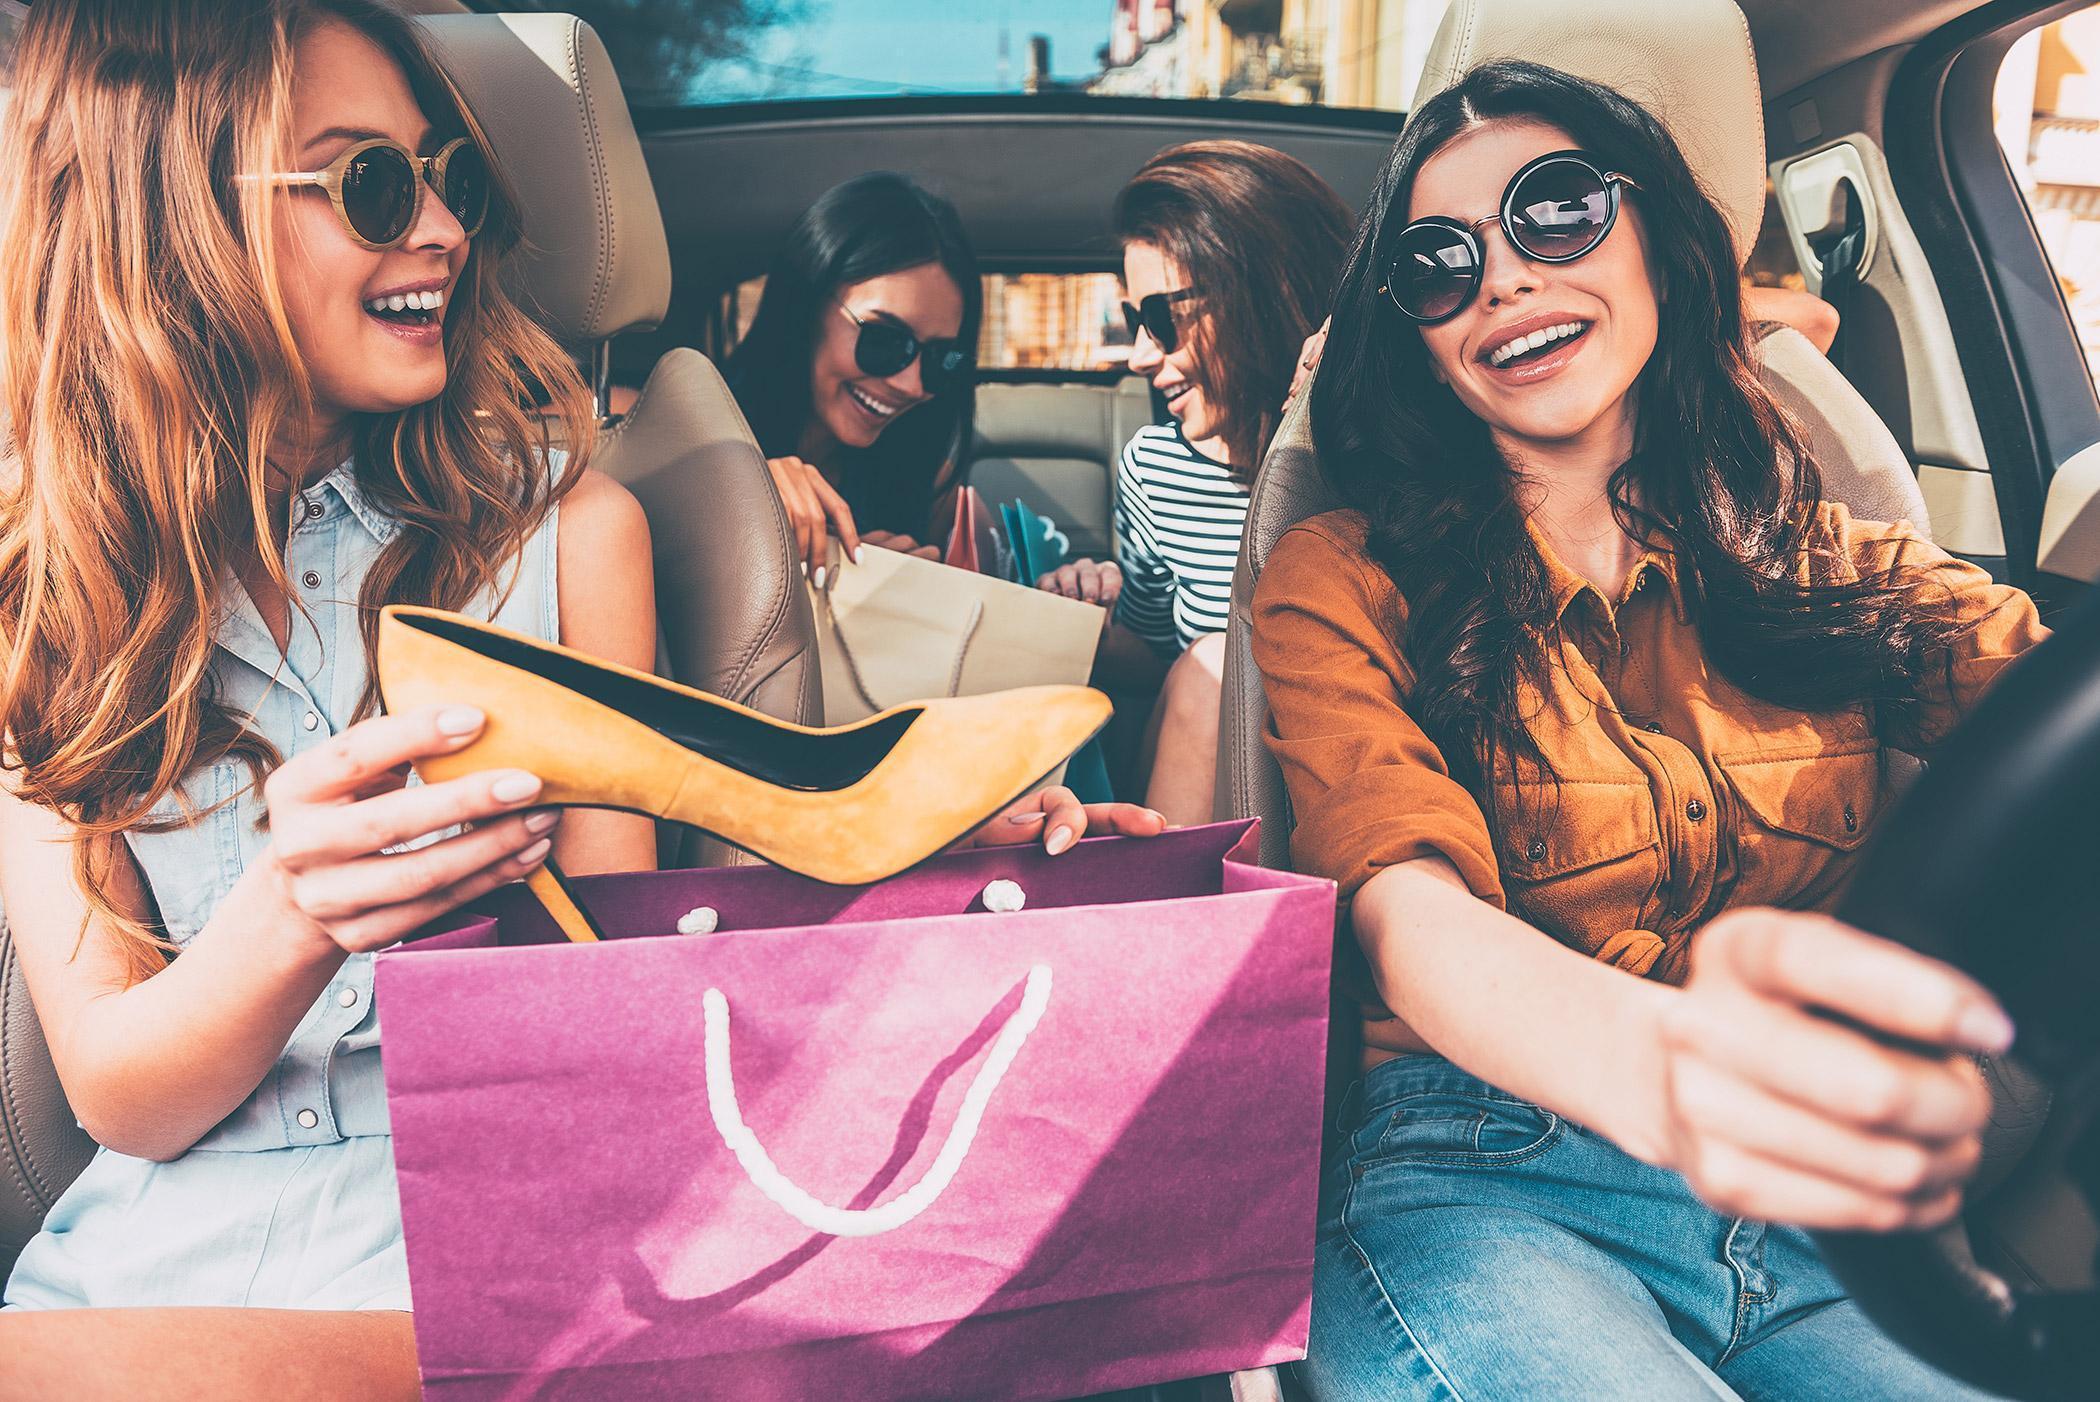 viaje compras buen fin auto chicas bolsas zapatos